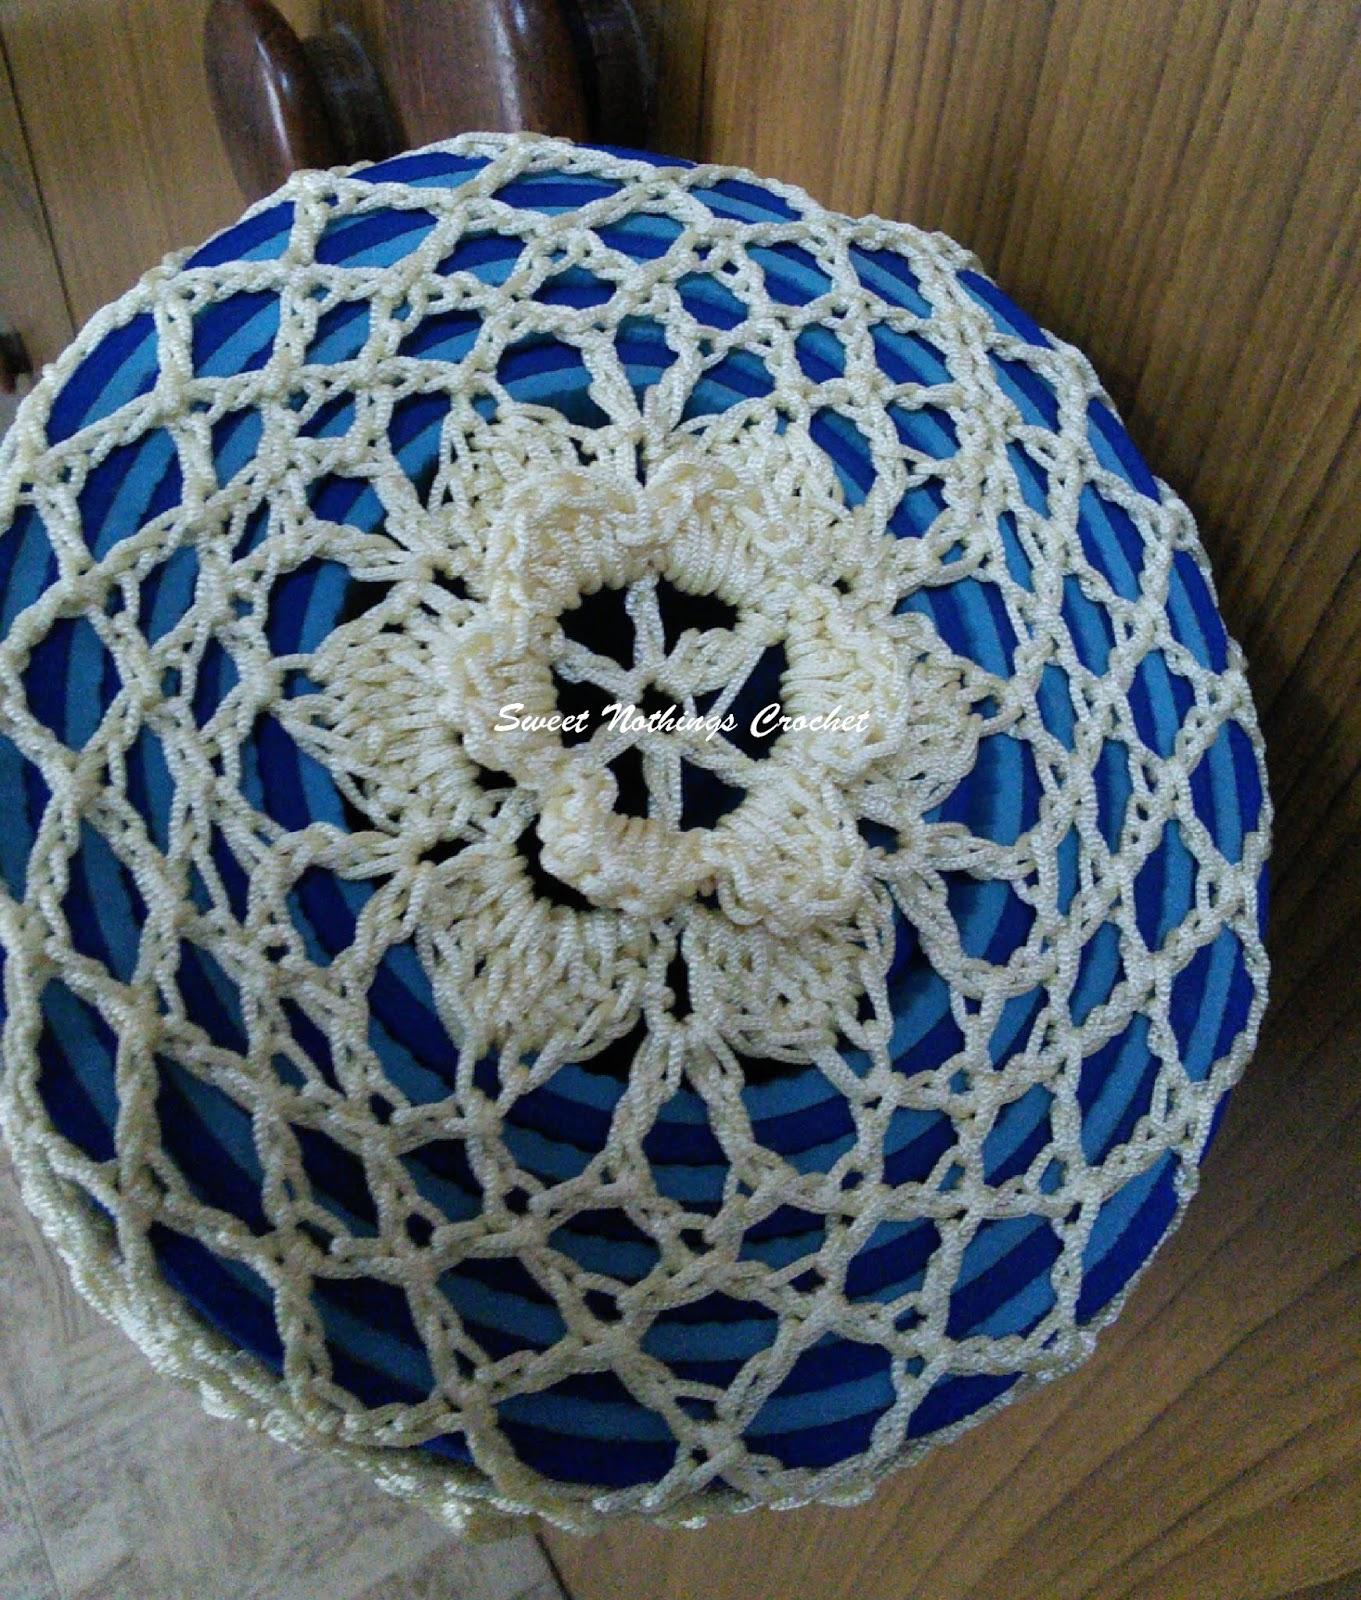 Sweet Nothings Crochet Yoga Mat Bag With An Irish Rose Granny Square